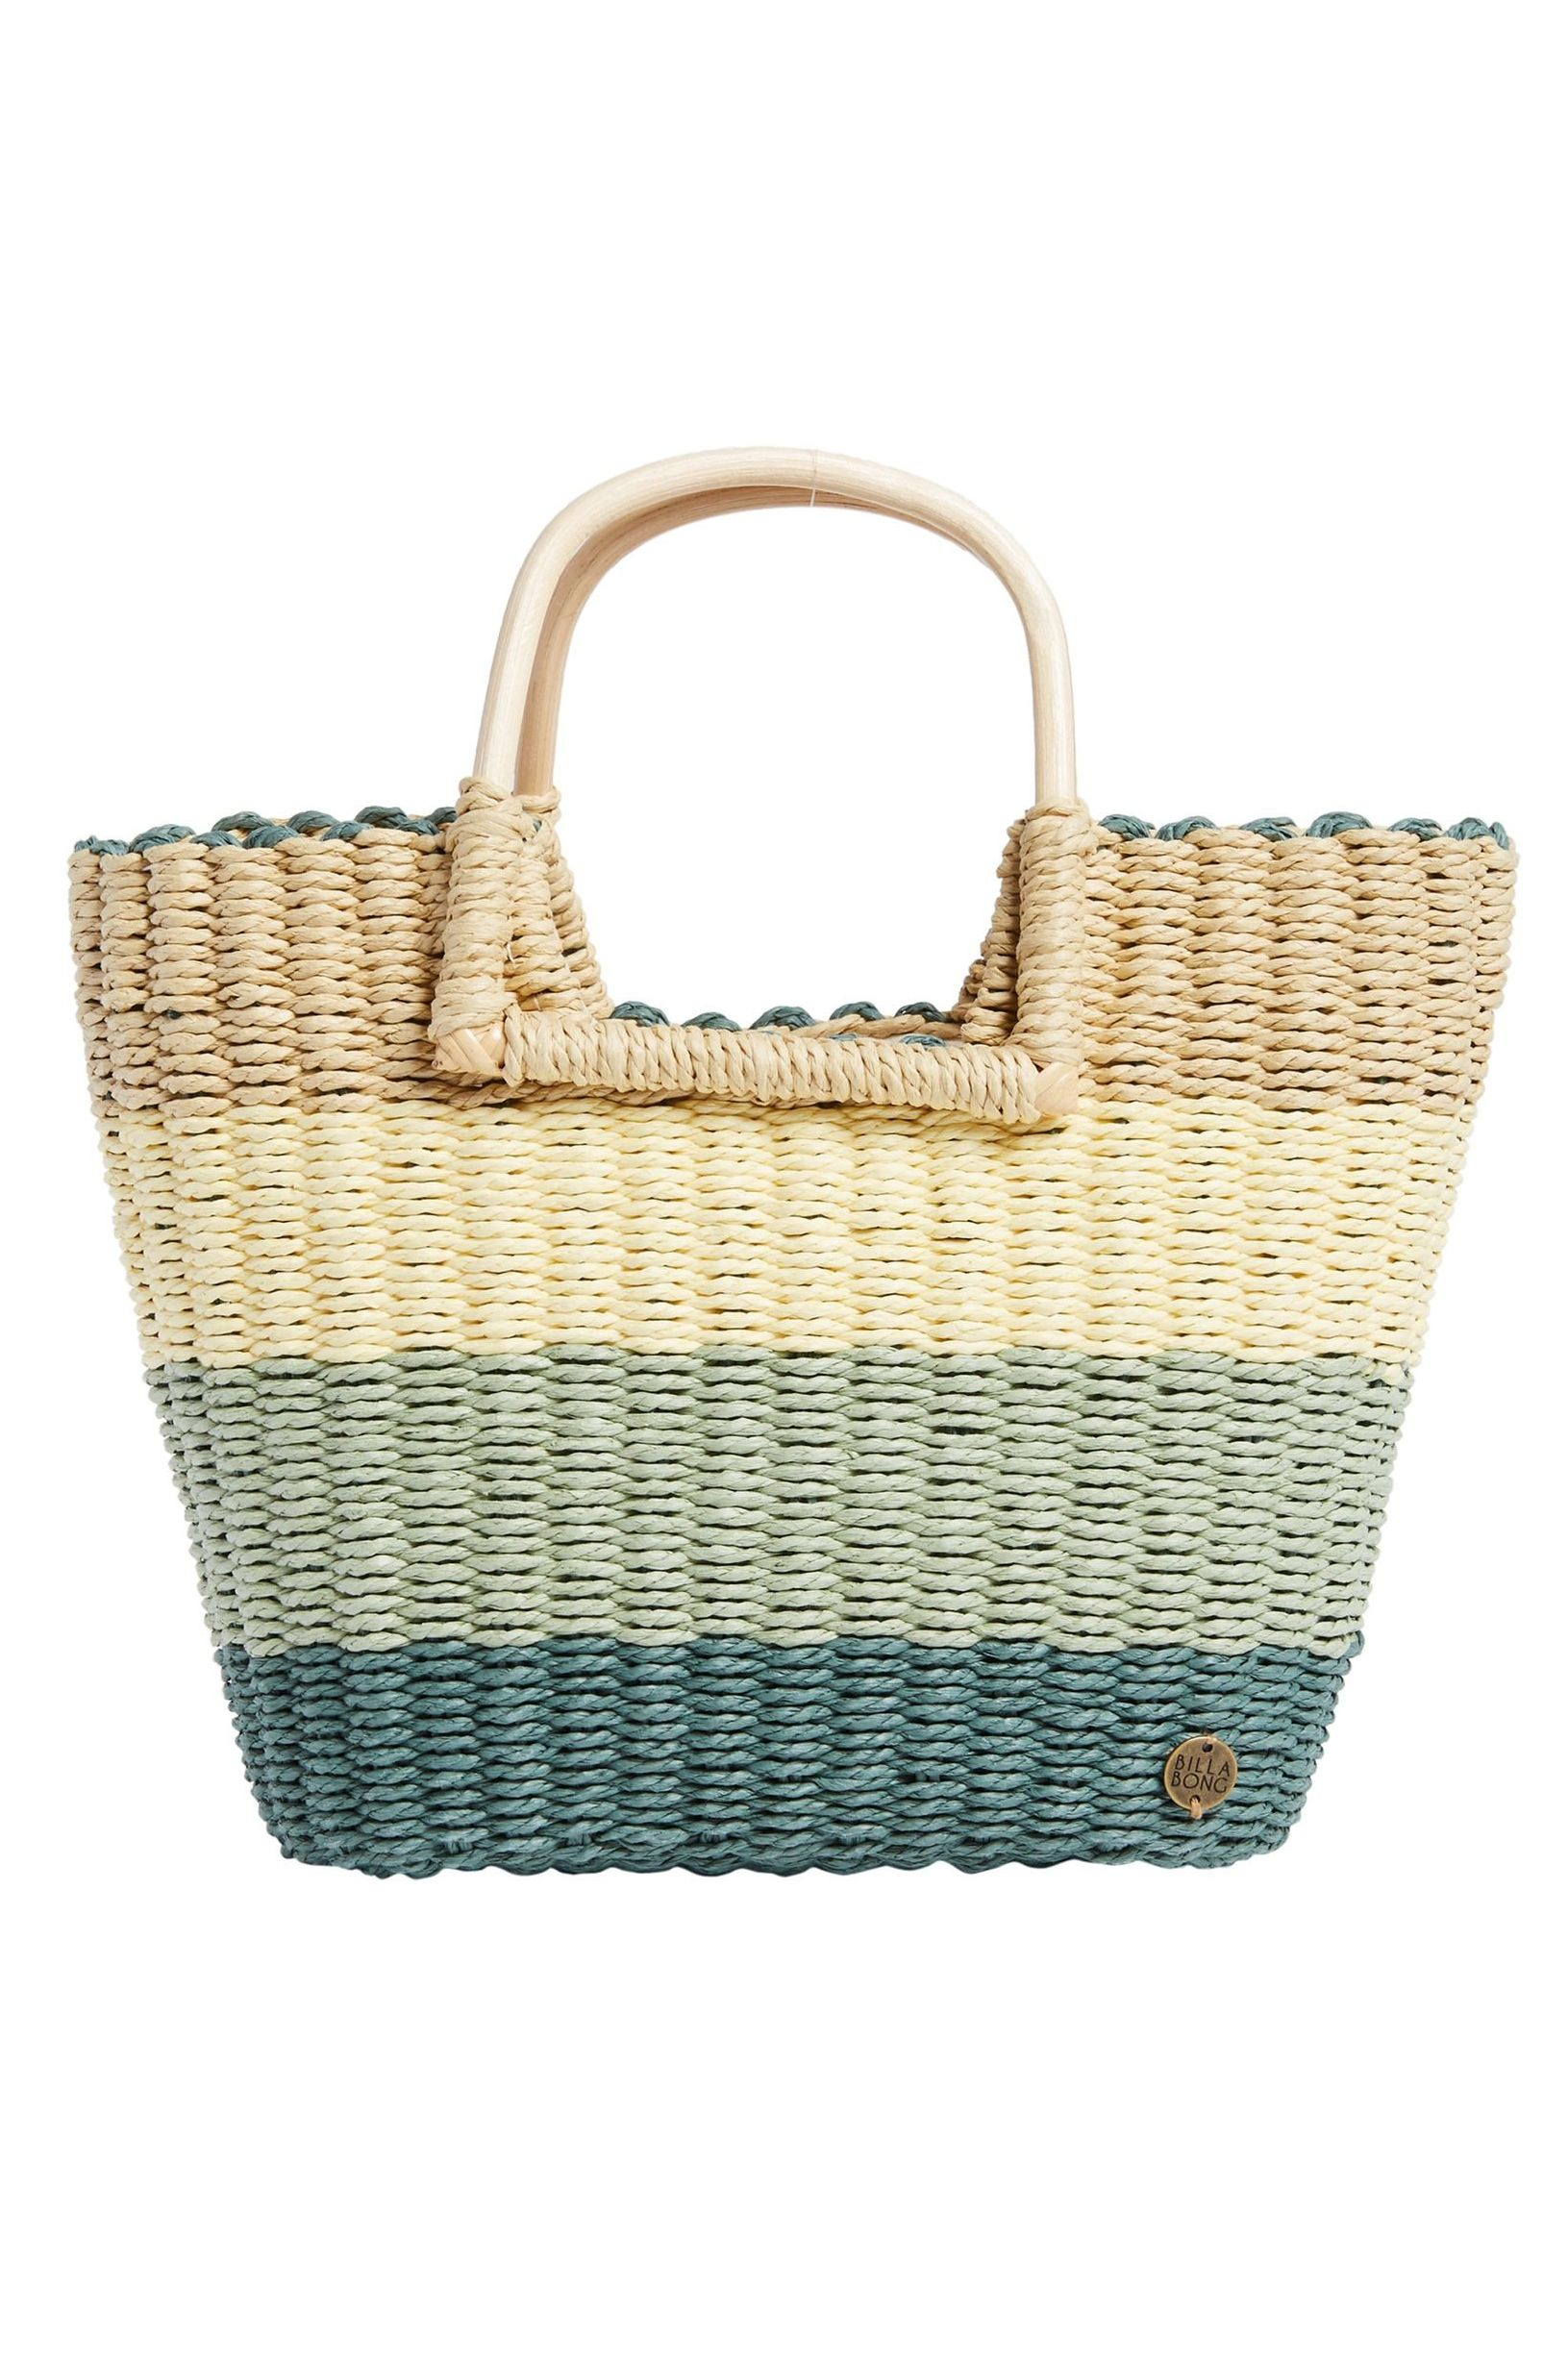 Billabong Bag  RIDE THE WAVES SALTY BLONDE Clover